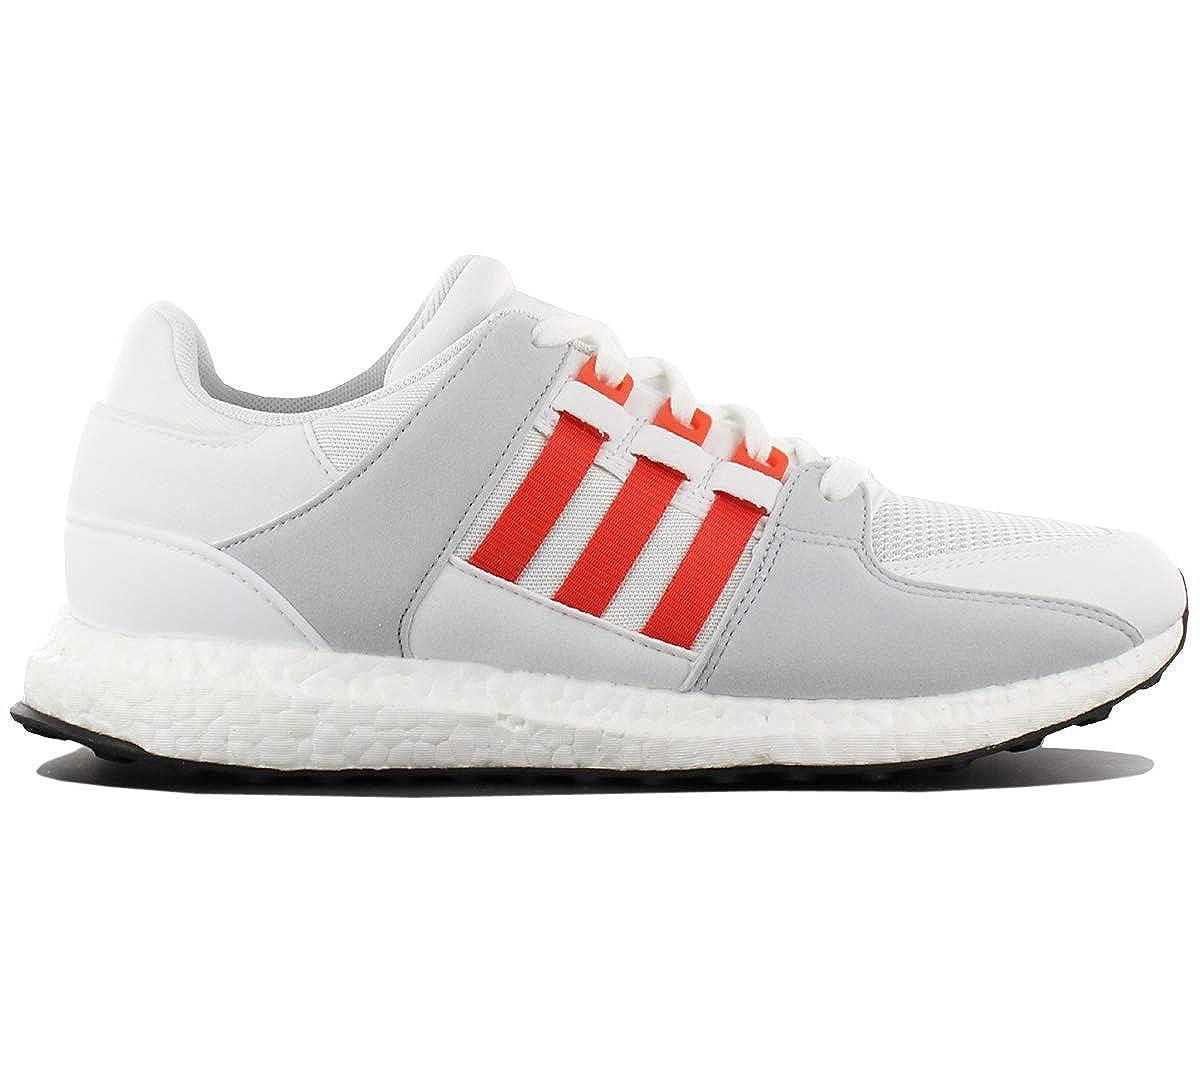 Support Originals Bold Eqt Adidas Equipment White UltraFootwear X80OnPkw